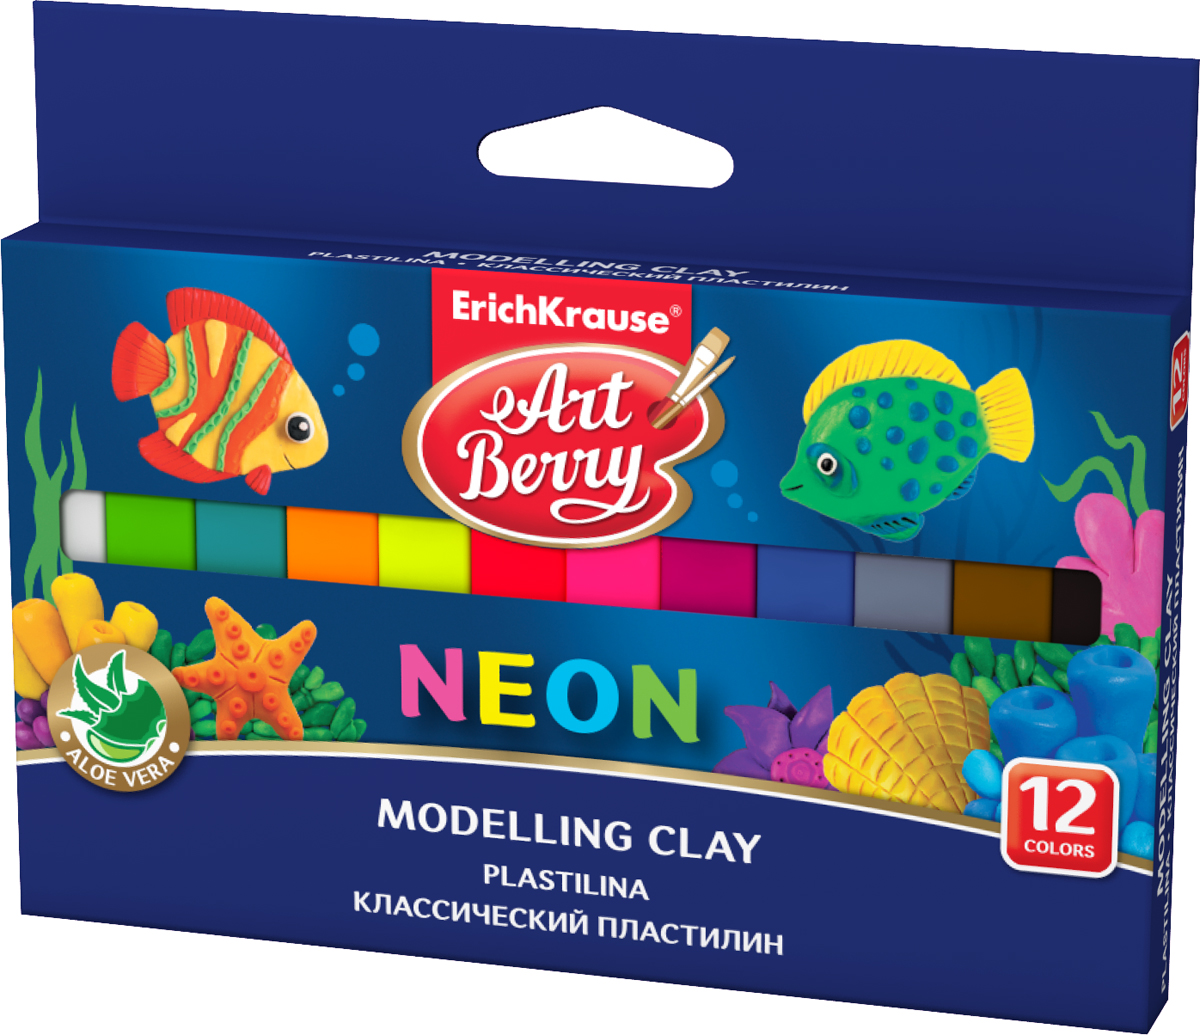 Пластилин ArtBerry Neon, с алоэ вера, 12 цветов, 180 г пластилин люкс 12 цветов 14с 1035 08